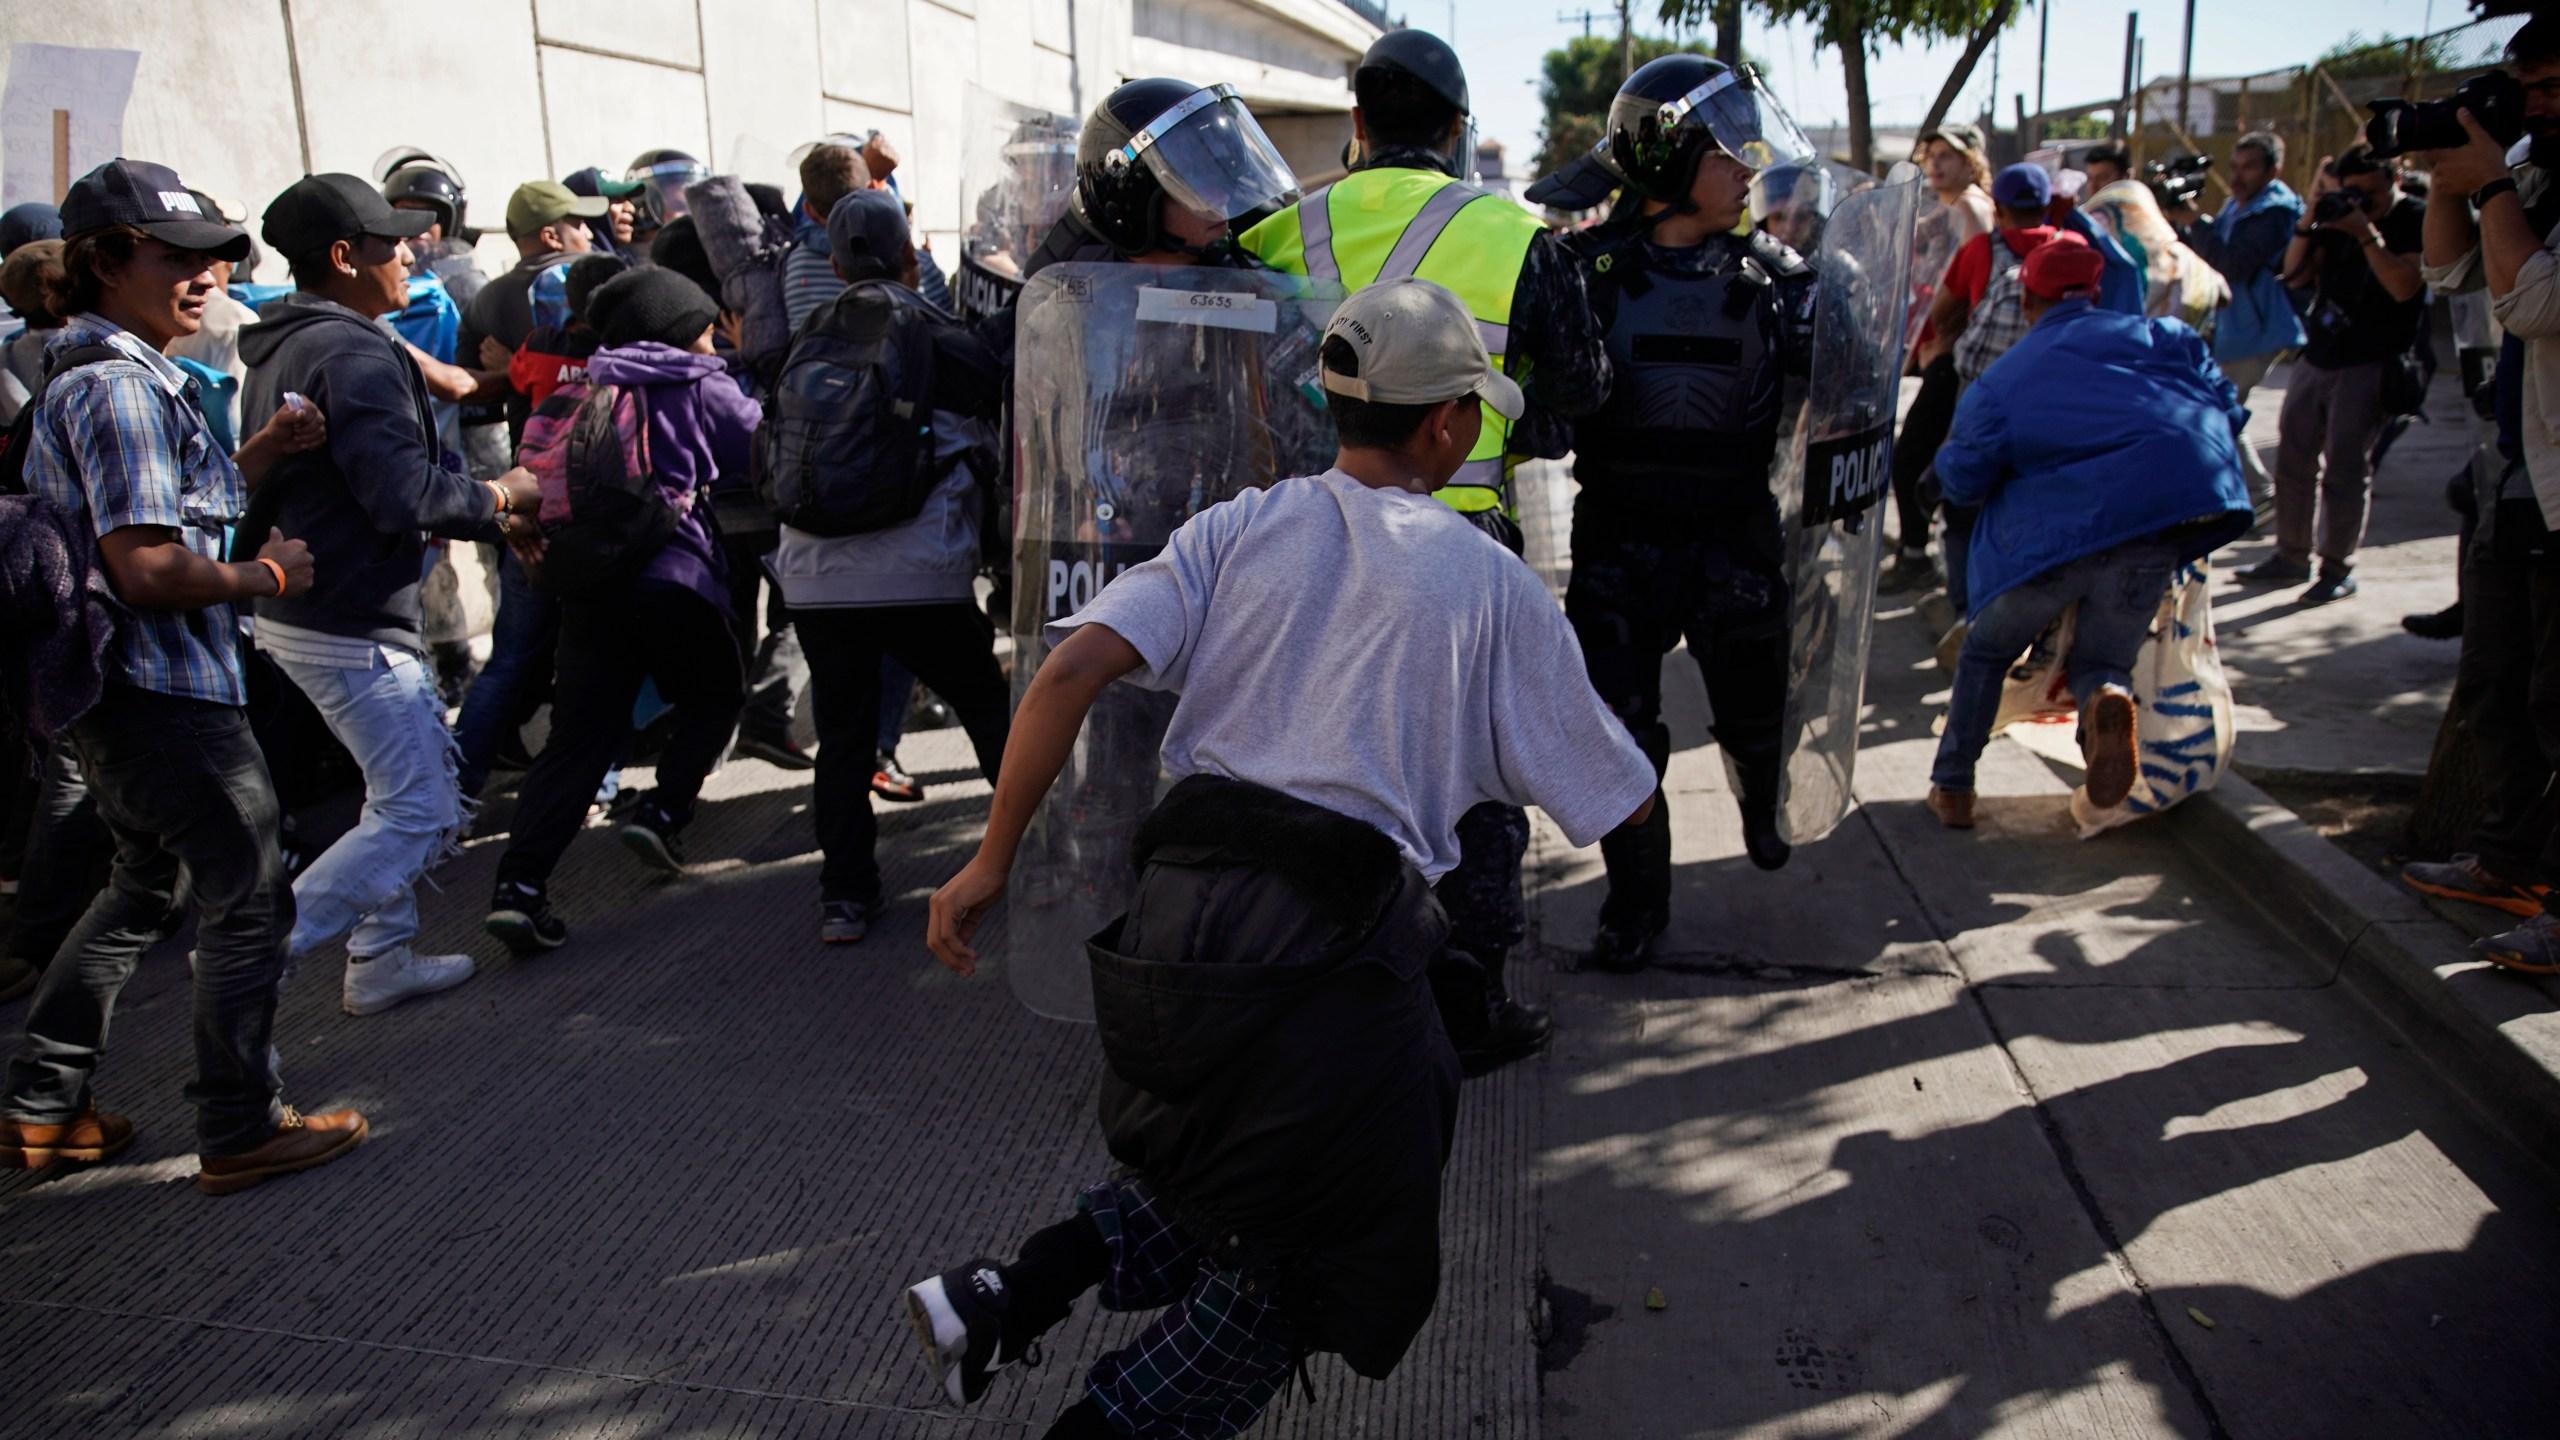 Central_America_Migrant_Caravan_27679-159532.jpg23432299